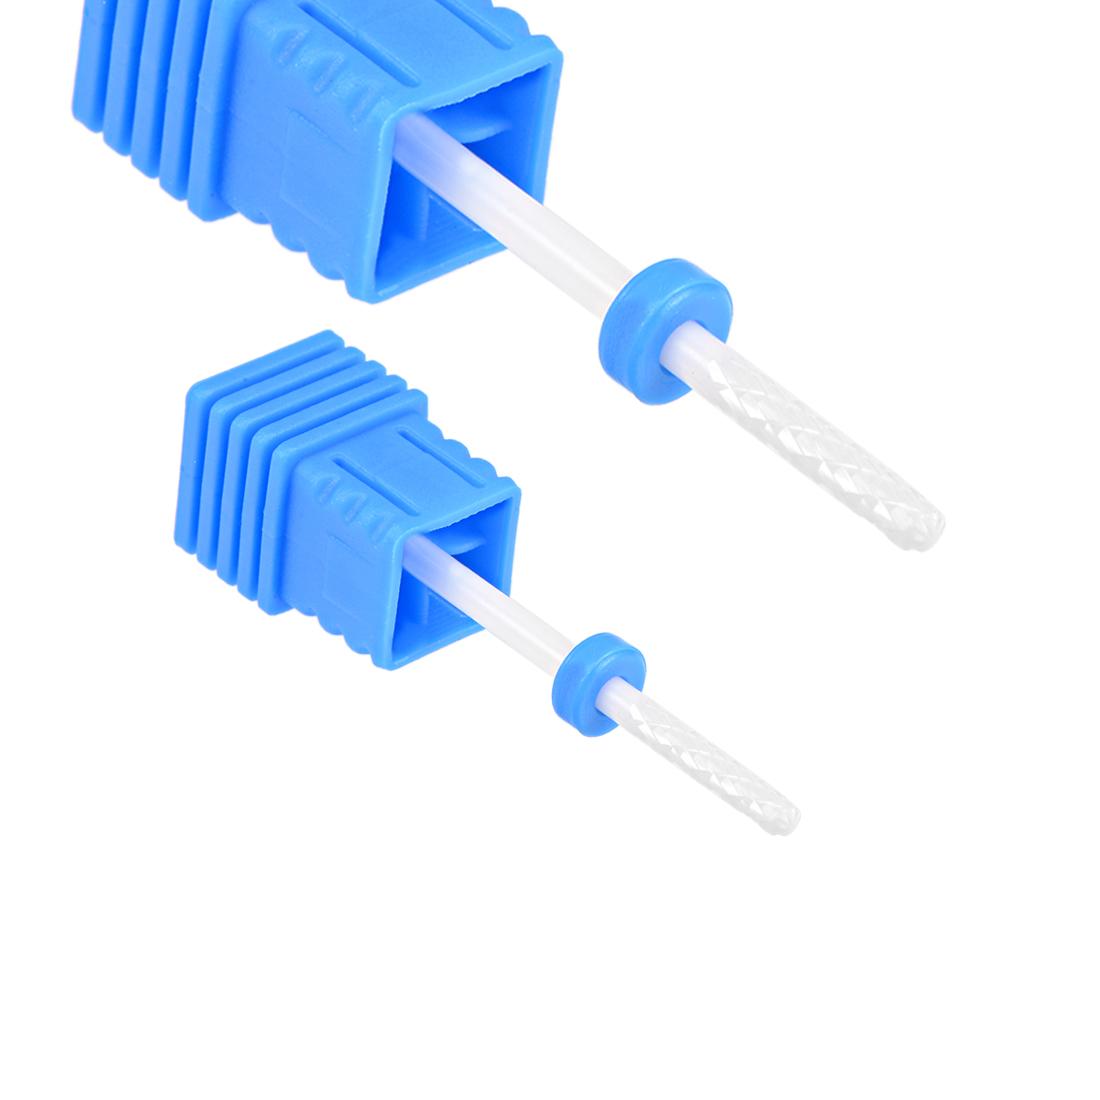 2pcs Ceramic Nail Drill Bits 3/32 inch (Medium Grit) Nails File Bit Blue